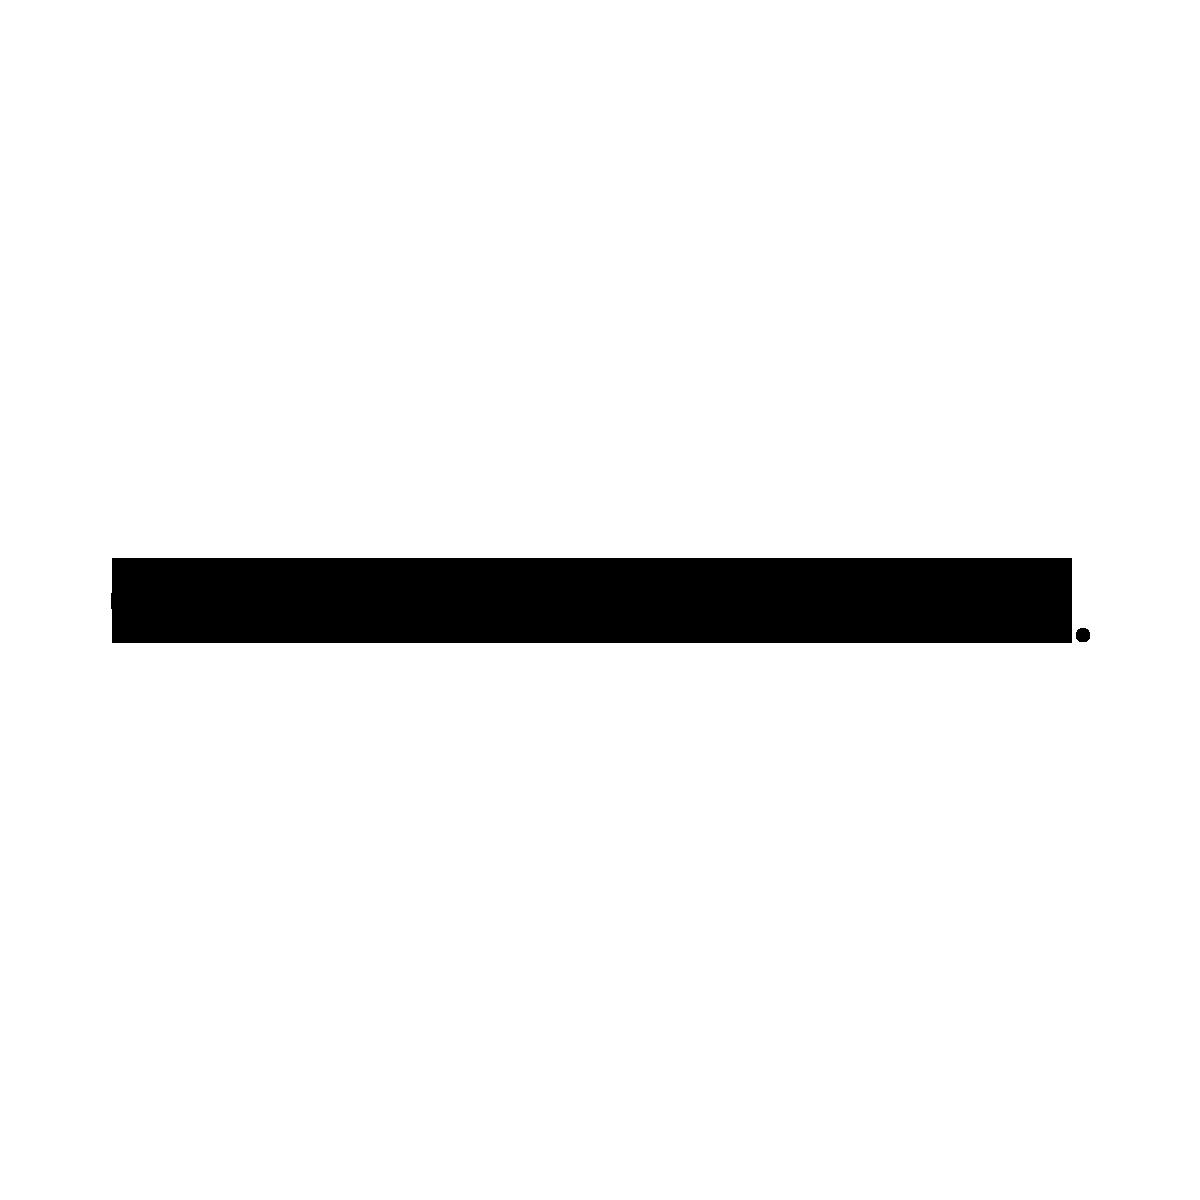 olijfgroene leren sneaker van shabbies amsterdam 101020010 met 3 cm plateau model